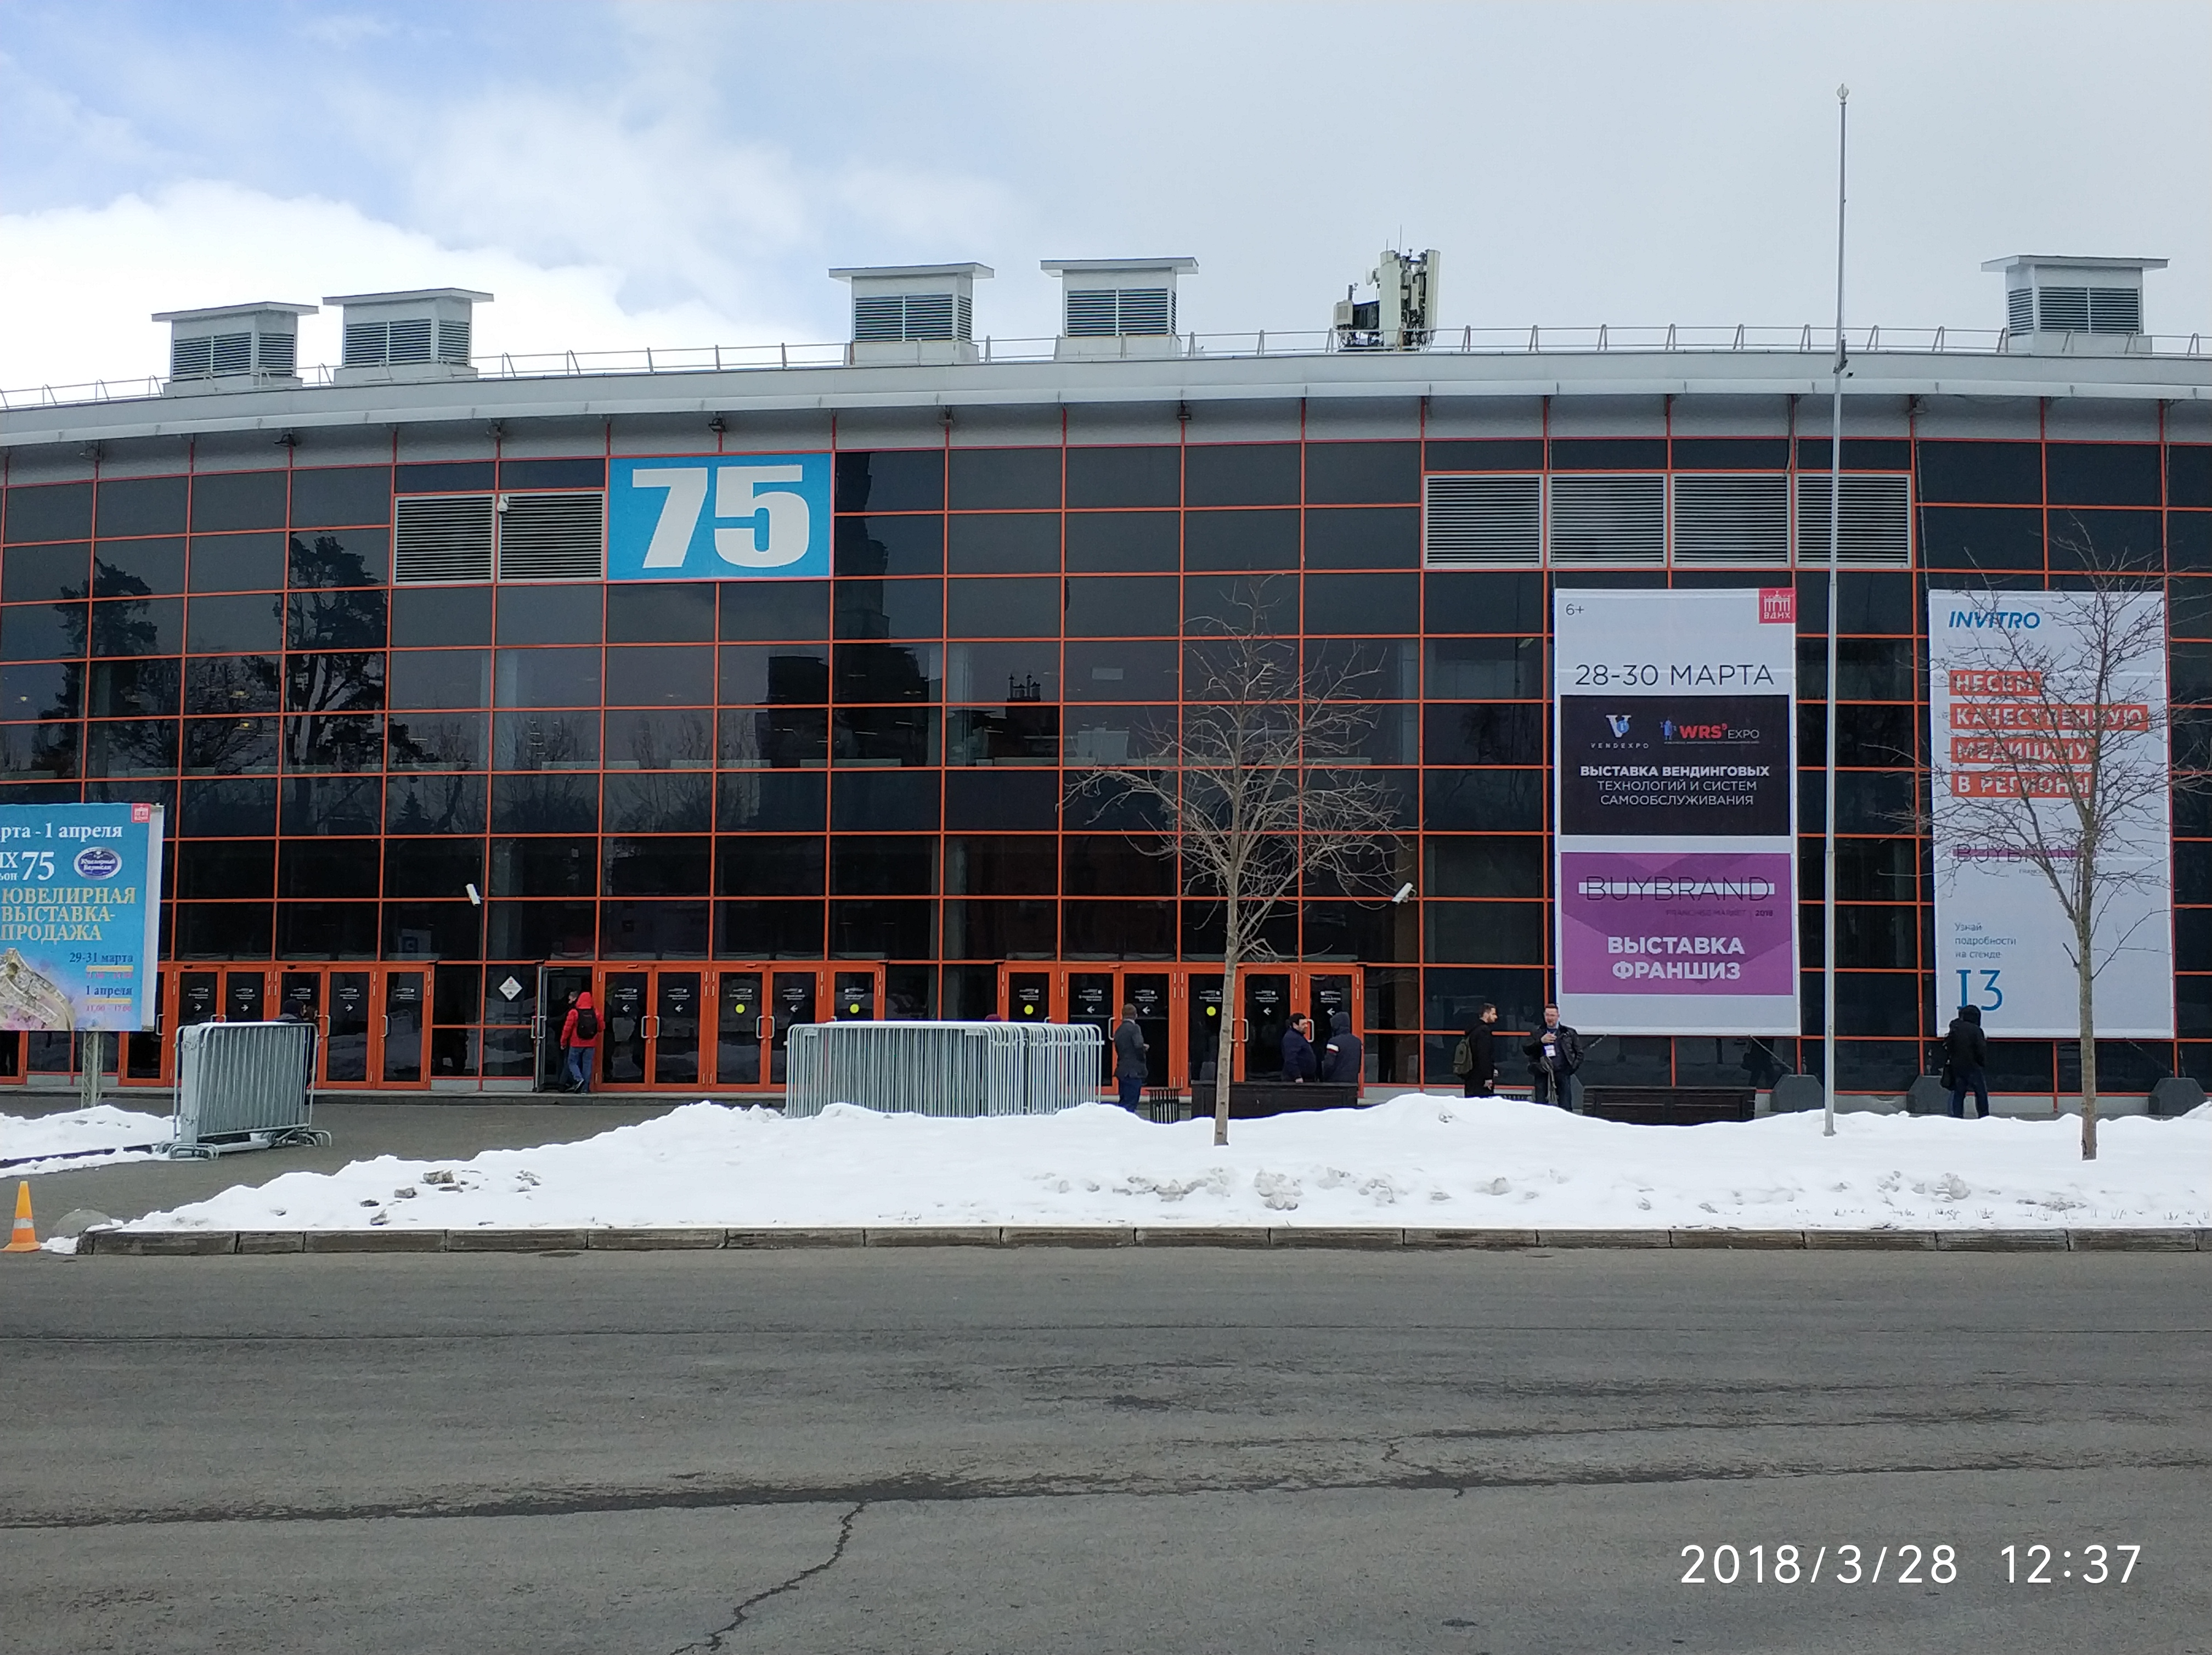 VendExpo 2018. Вид на павильон от 02.04.2018 9:08:00